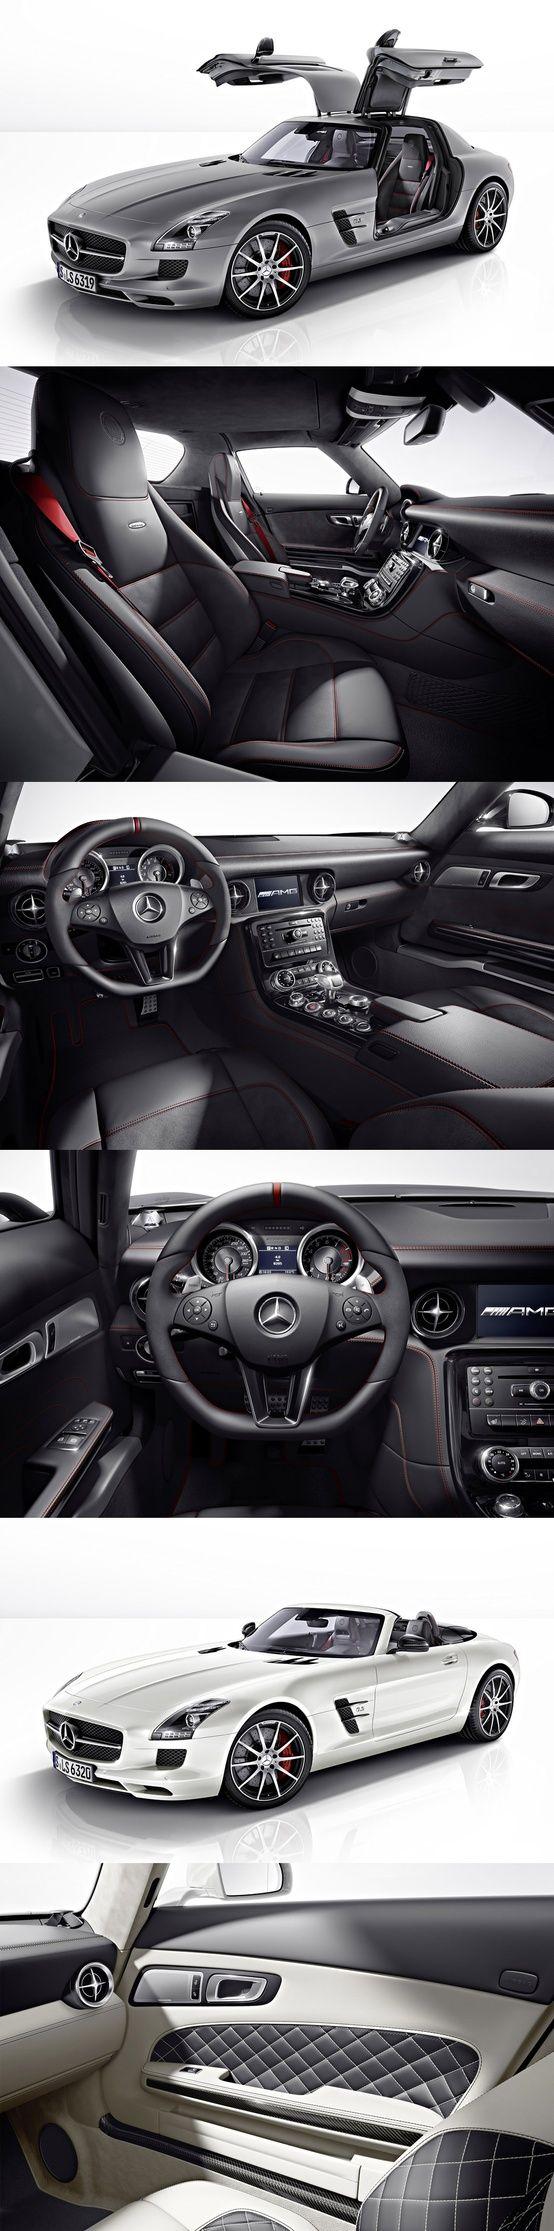 2013 Mercedes Benz SLS AMG GT https://www.amazon.co.uk/Baby-Car-Mirror-Shatterproof-Installation/dp/B06XHG6SSY